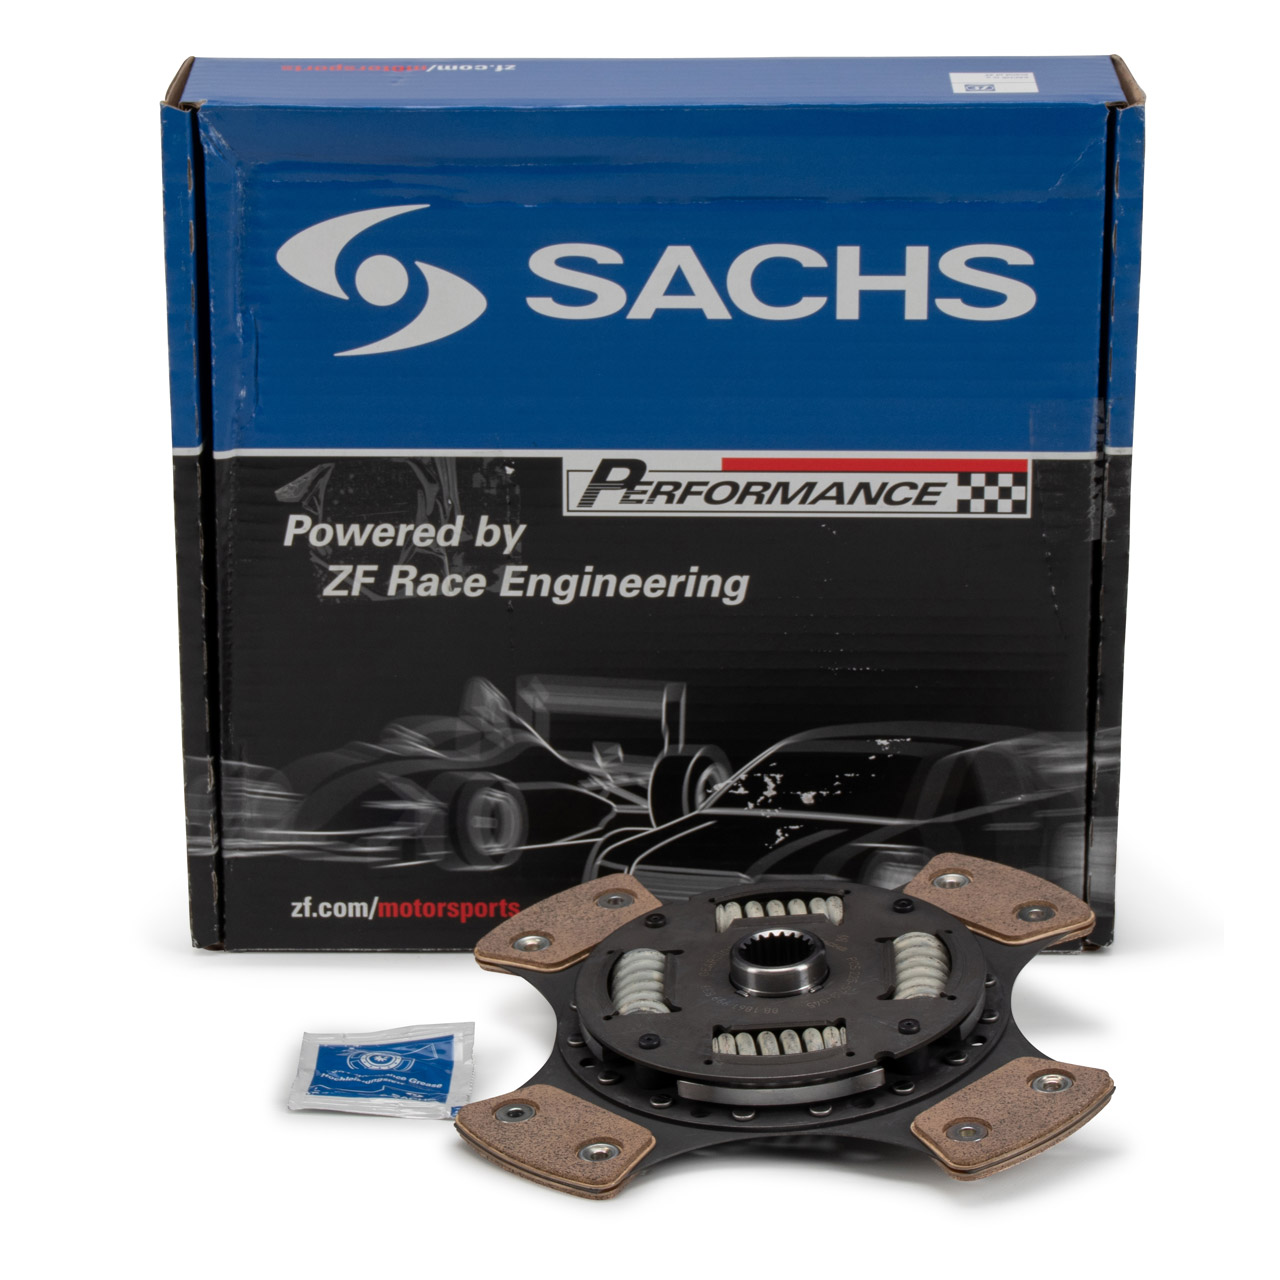 SACHS PERFORMANCE 881861999839 Kupplungsscheibe PORSCHE 911 2.3 T/E/S 2.7/3.0/3.2 Carrera